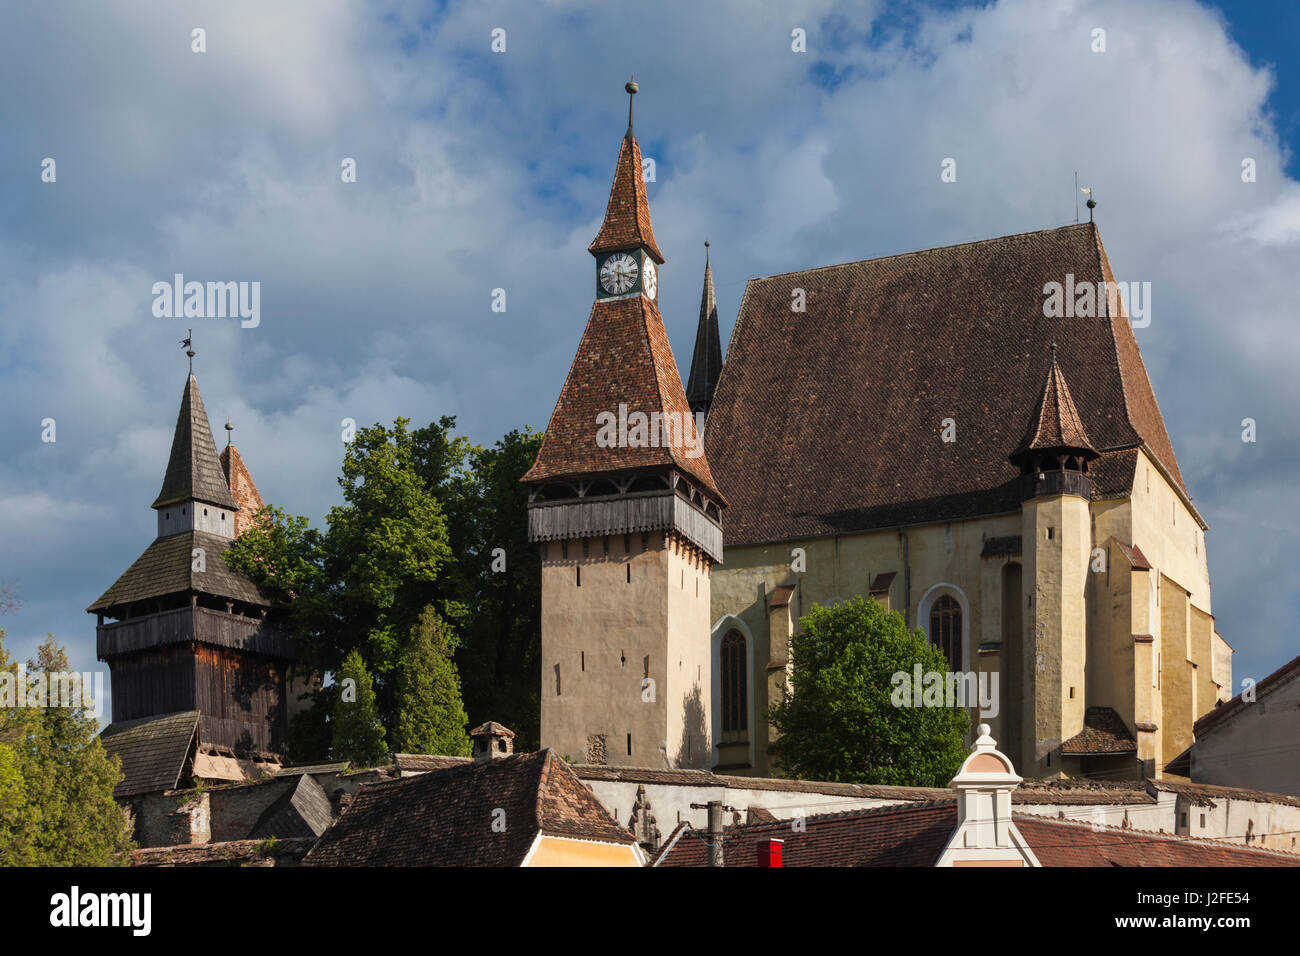 Romania, Transylvania, Biertan, 15th century fortified Saxon Church - Stock Image